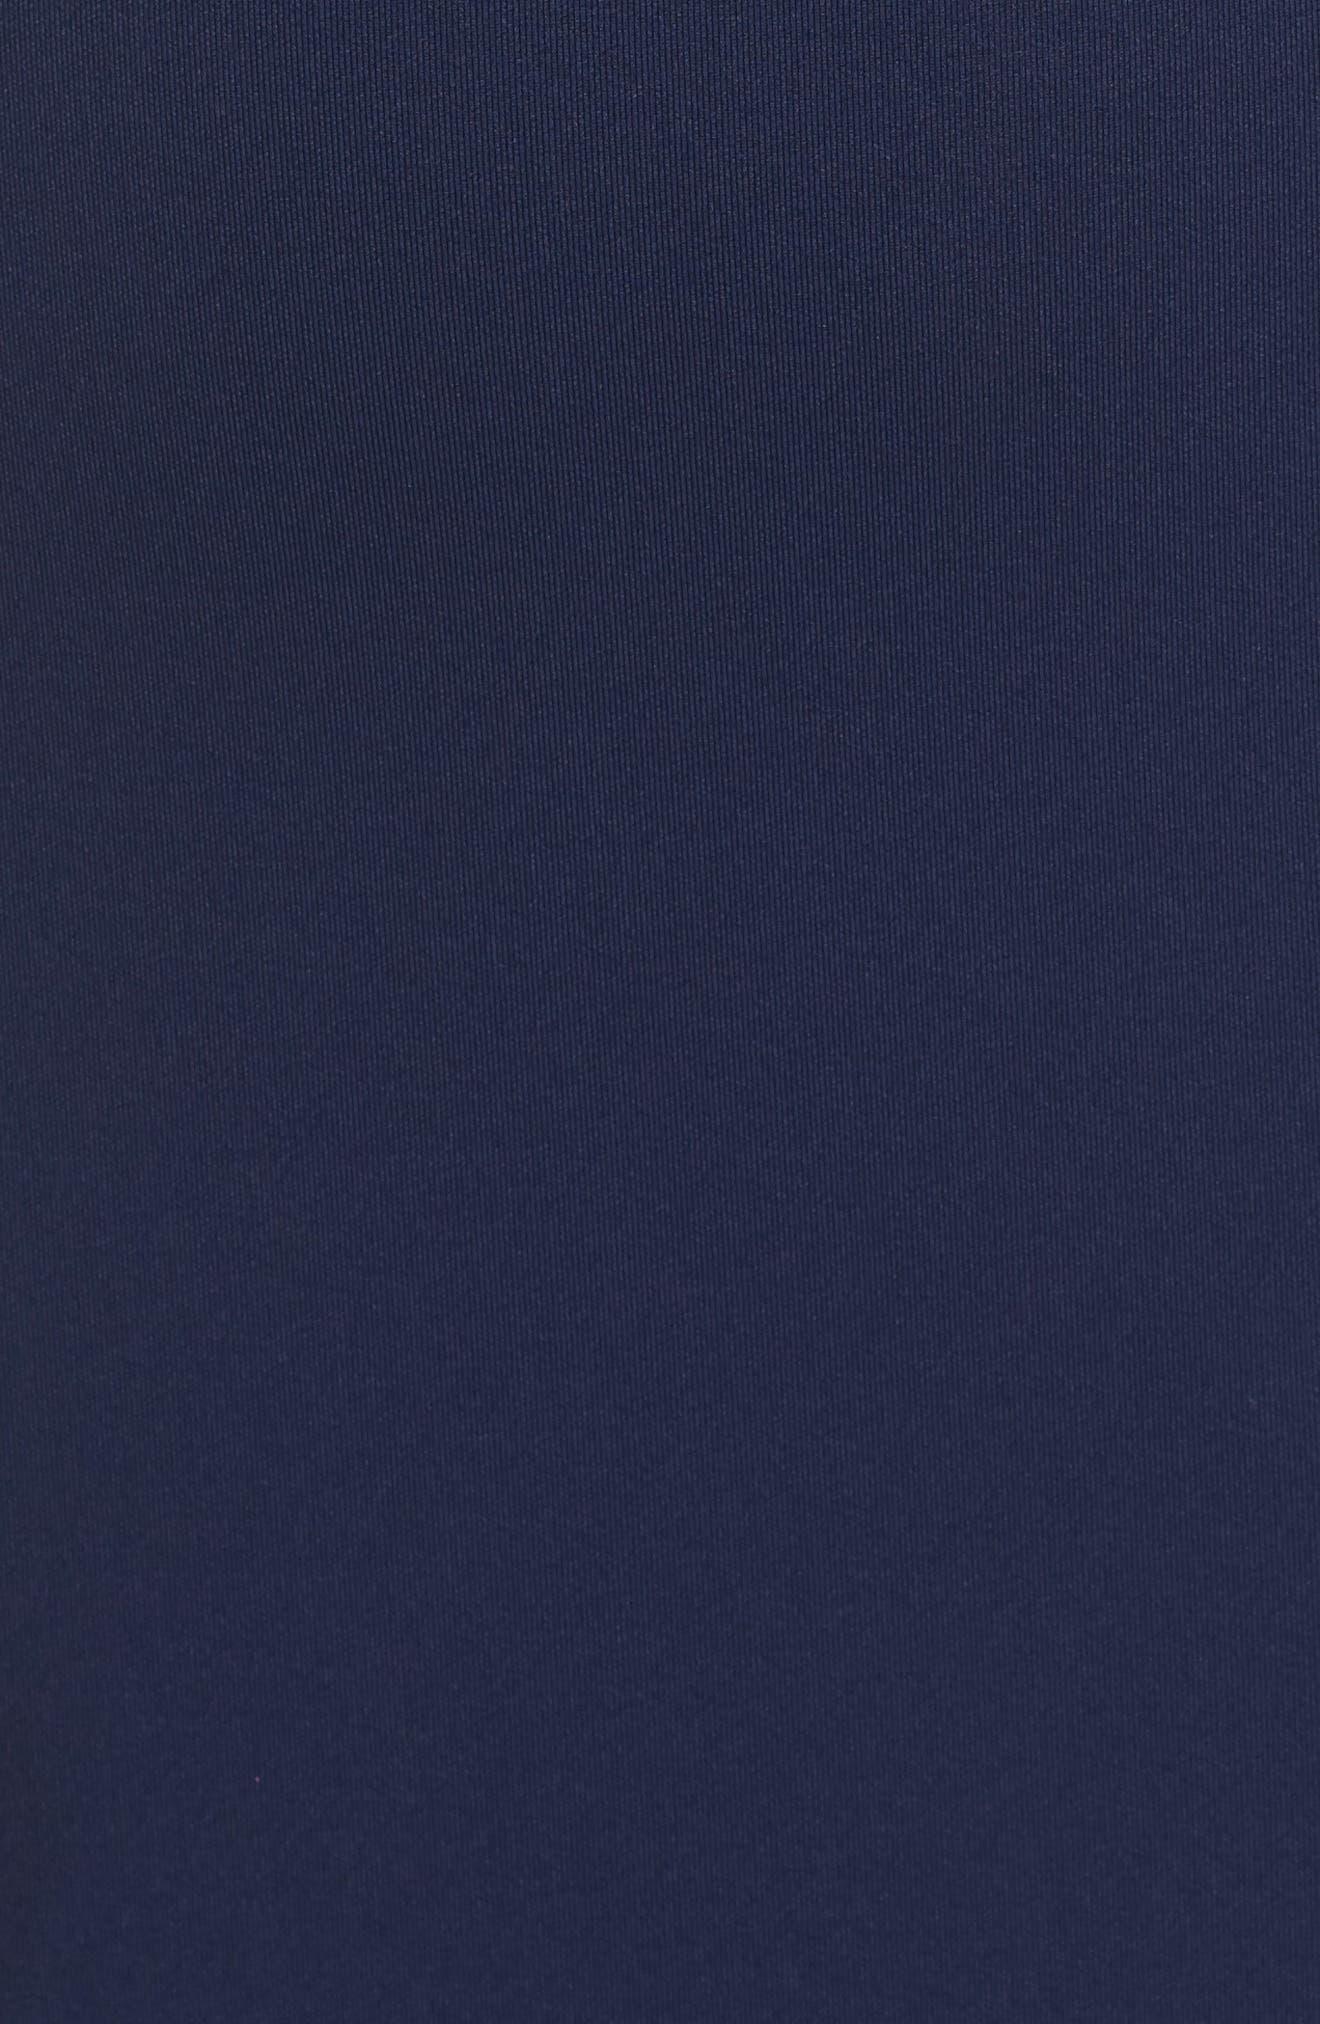 Lace Trim Sheath Dress,                             Alternate thumbnail 5, color,                             Midnight/ Black